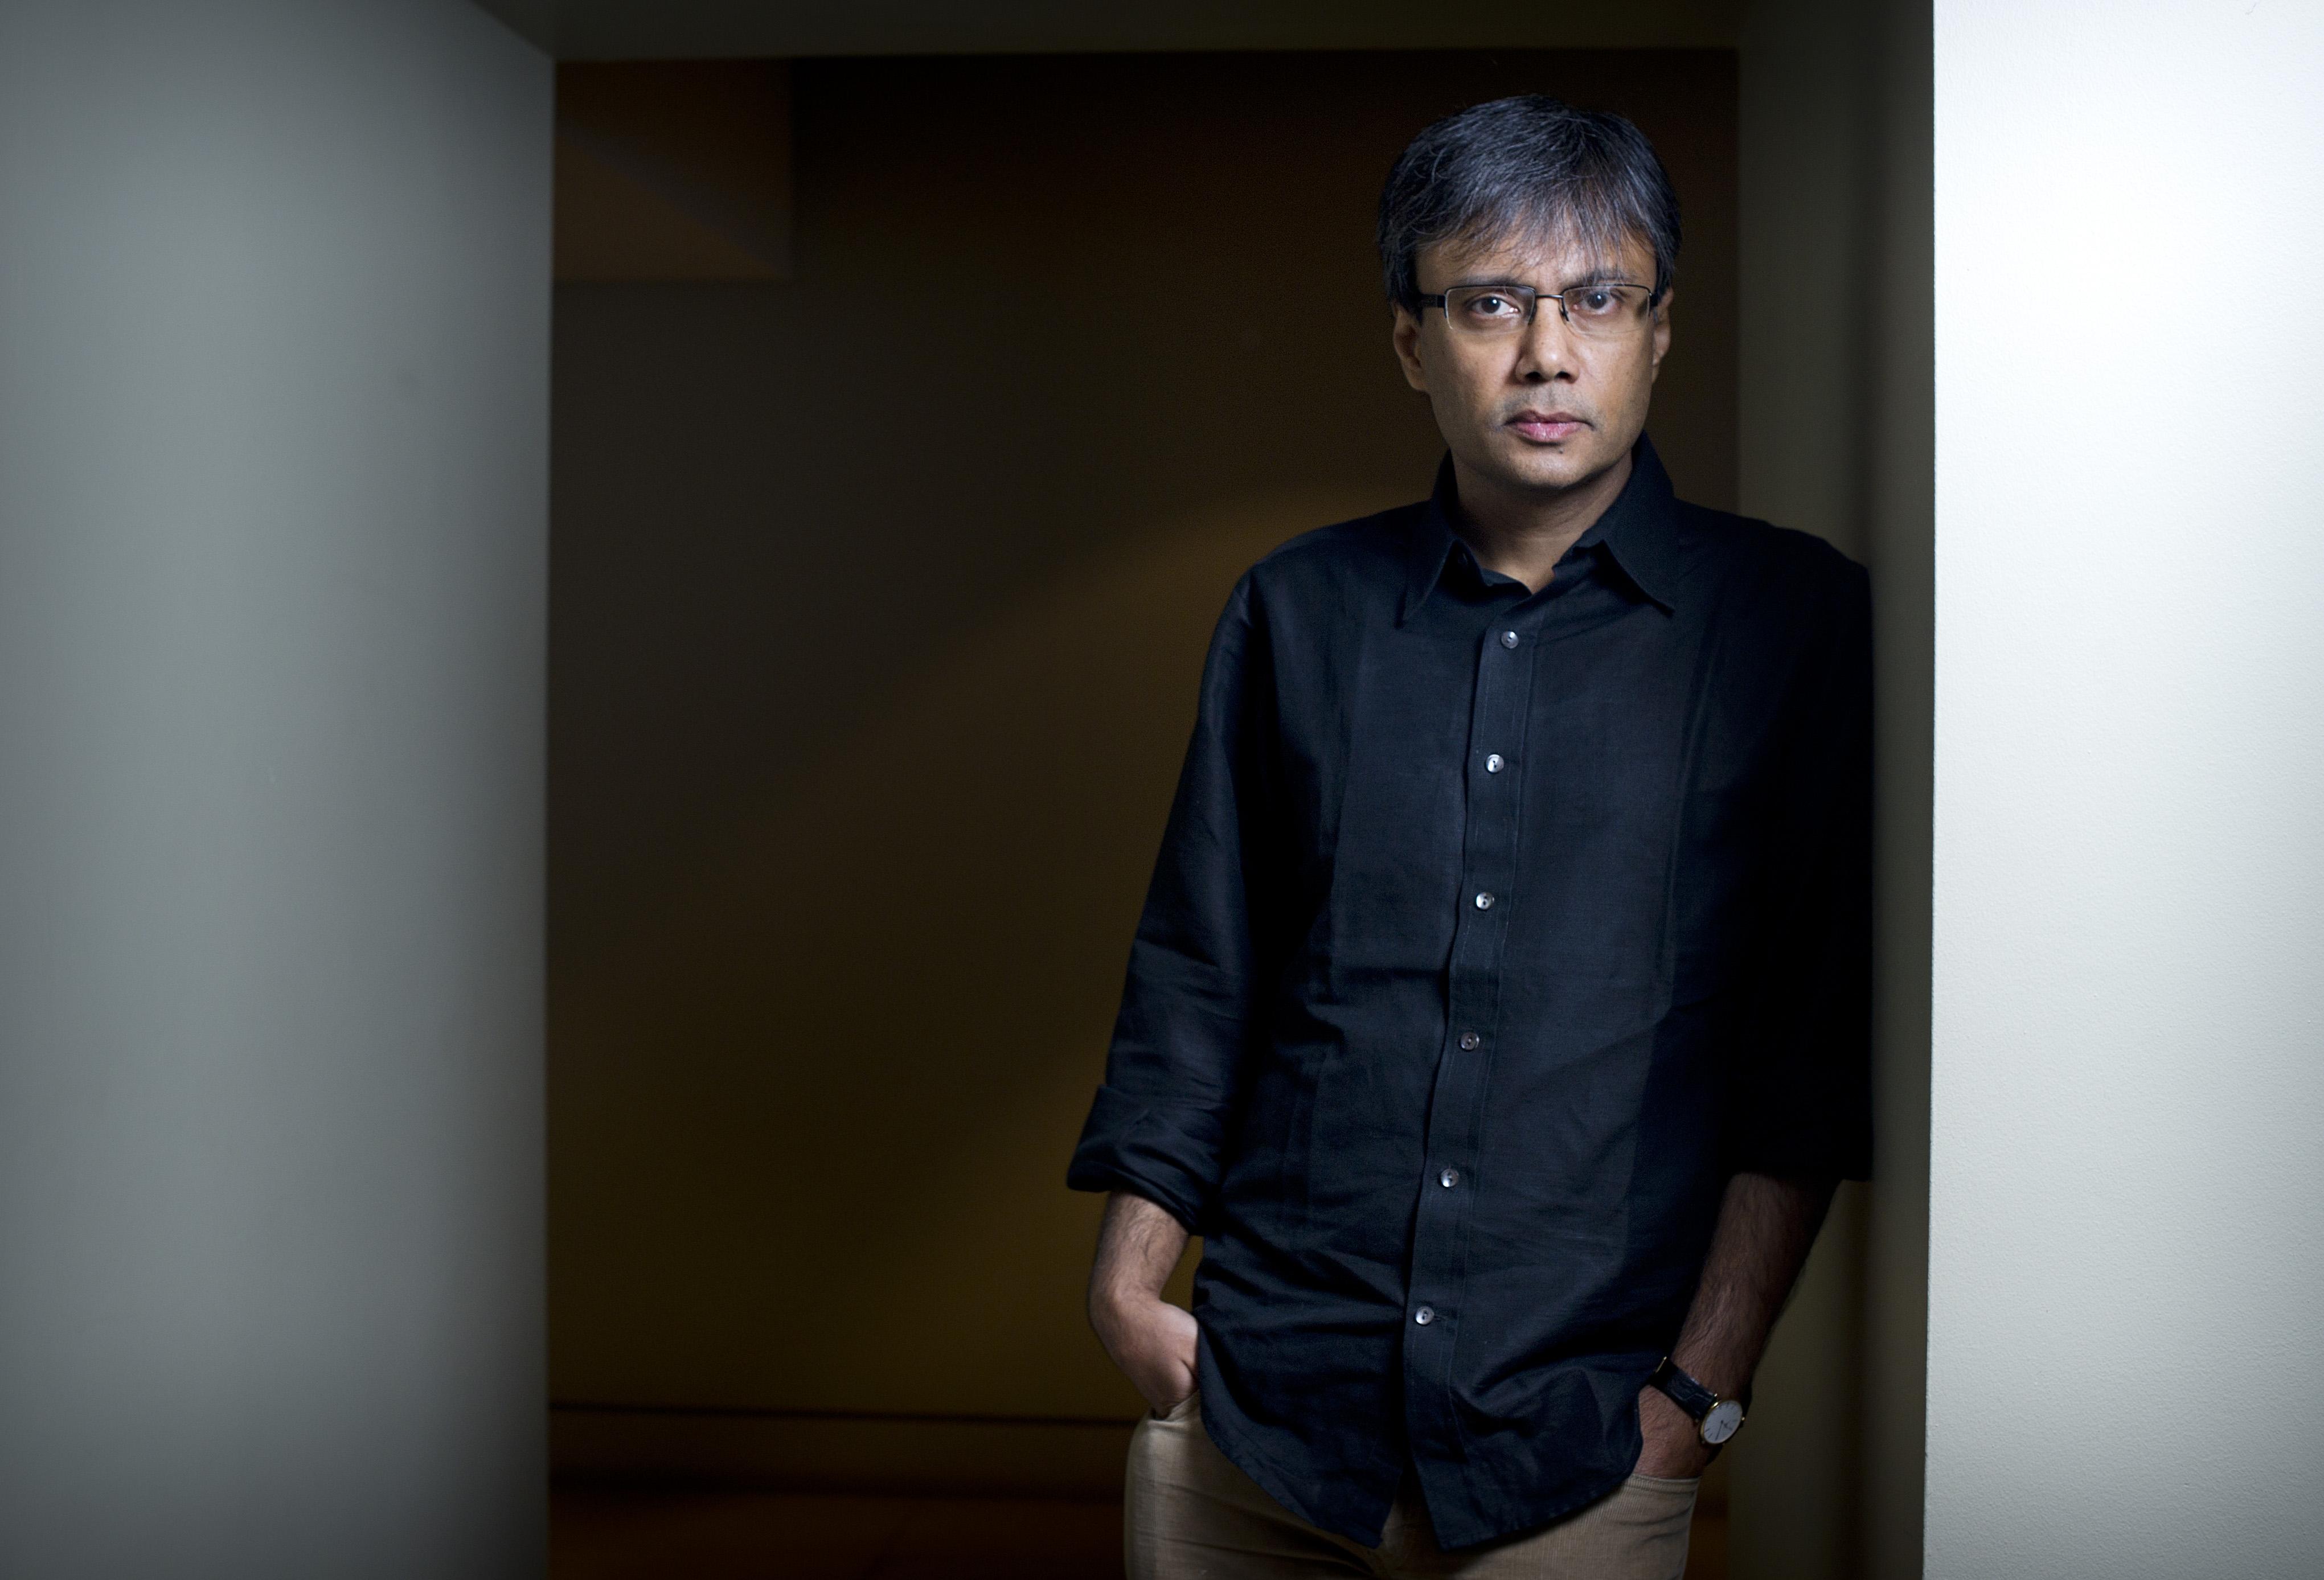 Amit Chaudhuri photo credit: Geoff Pugh